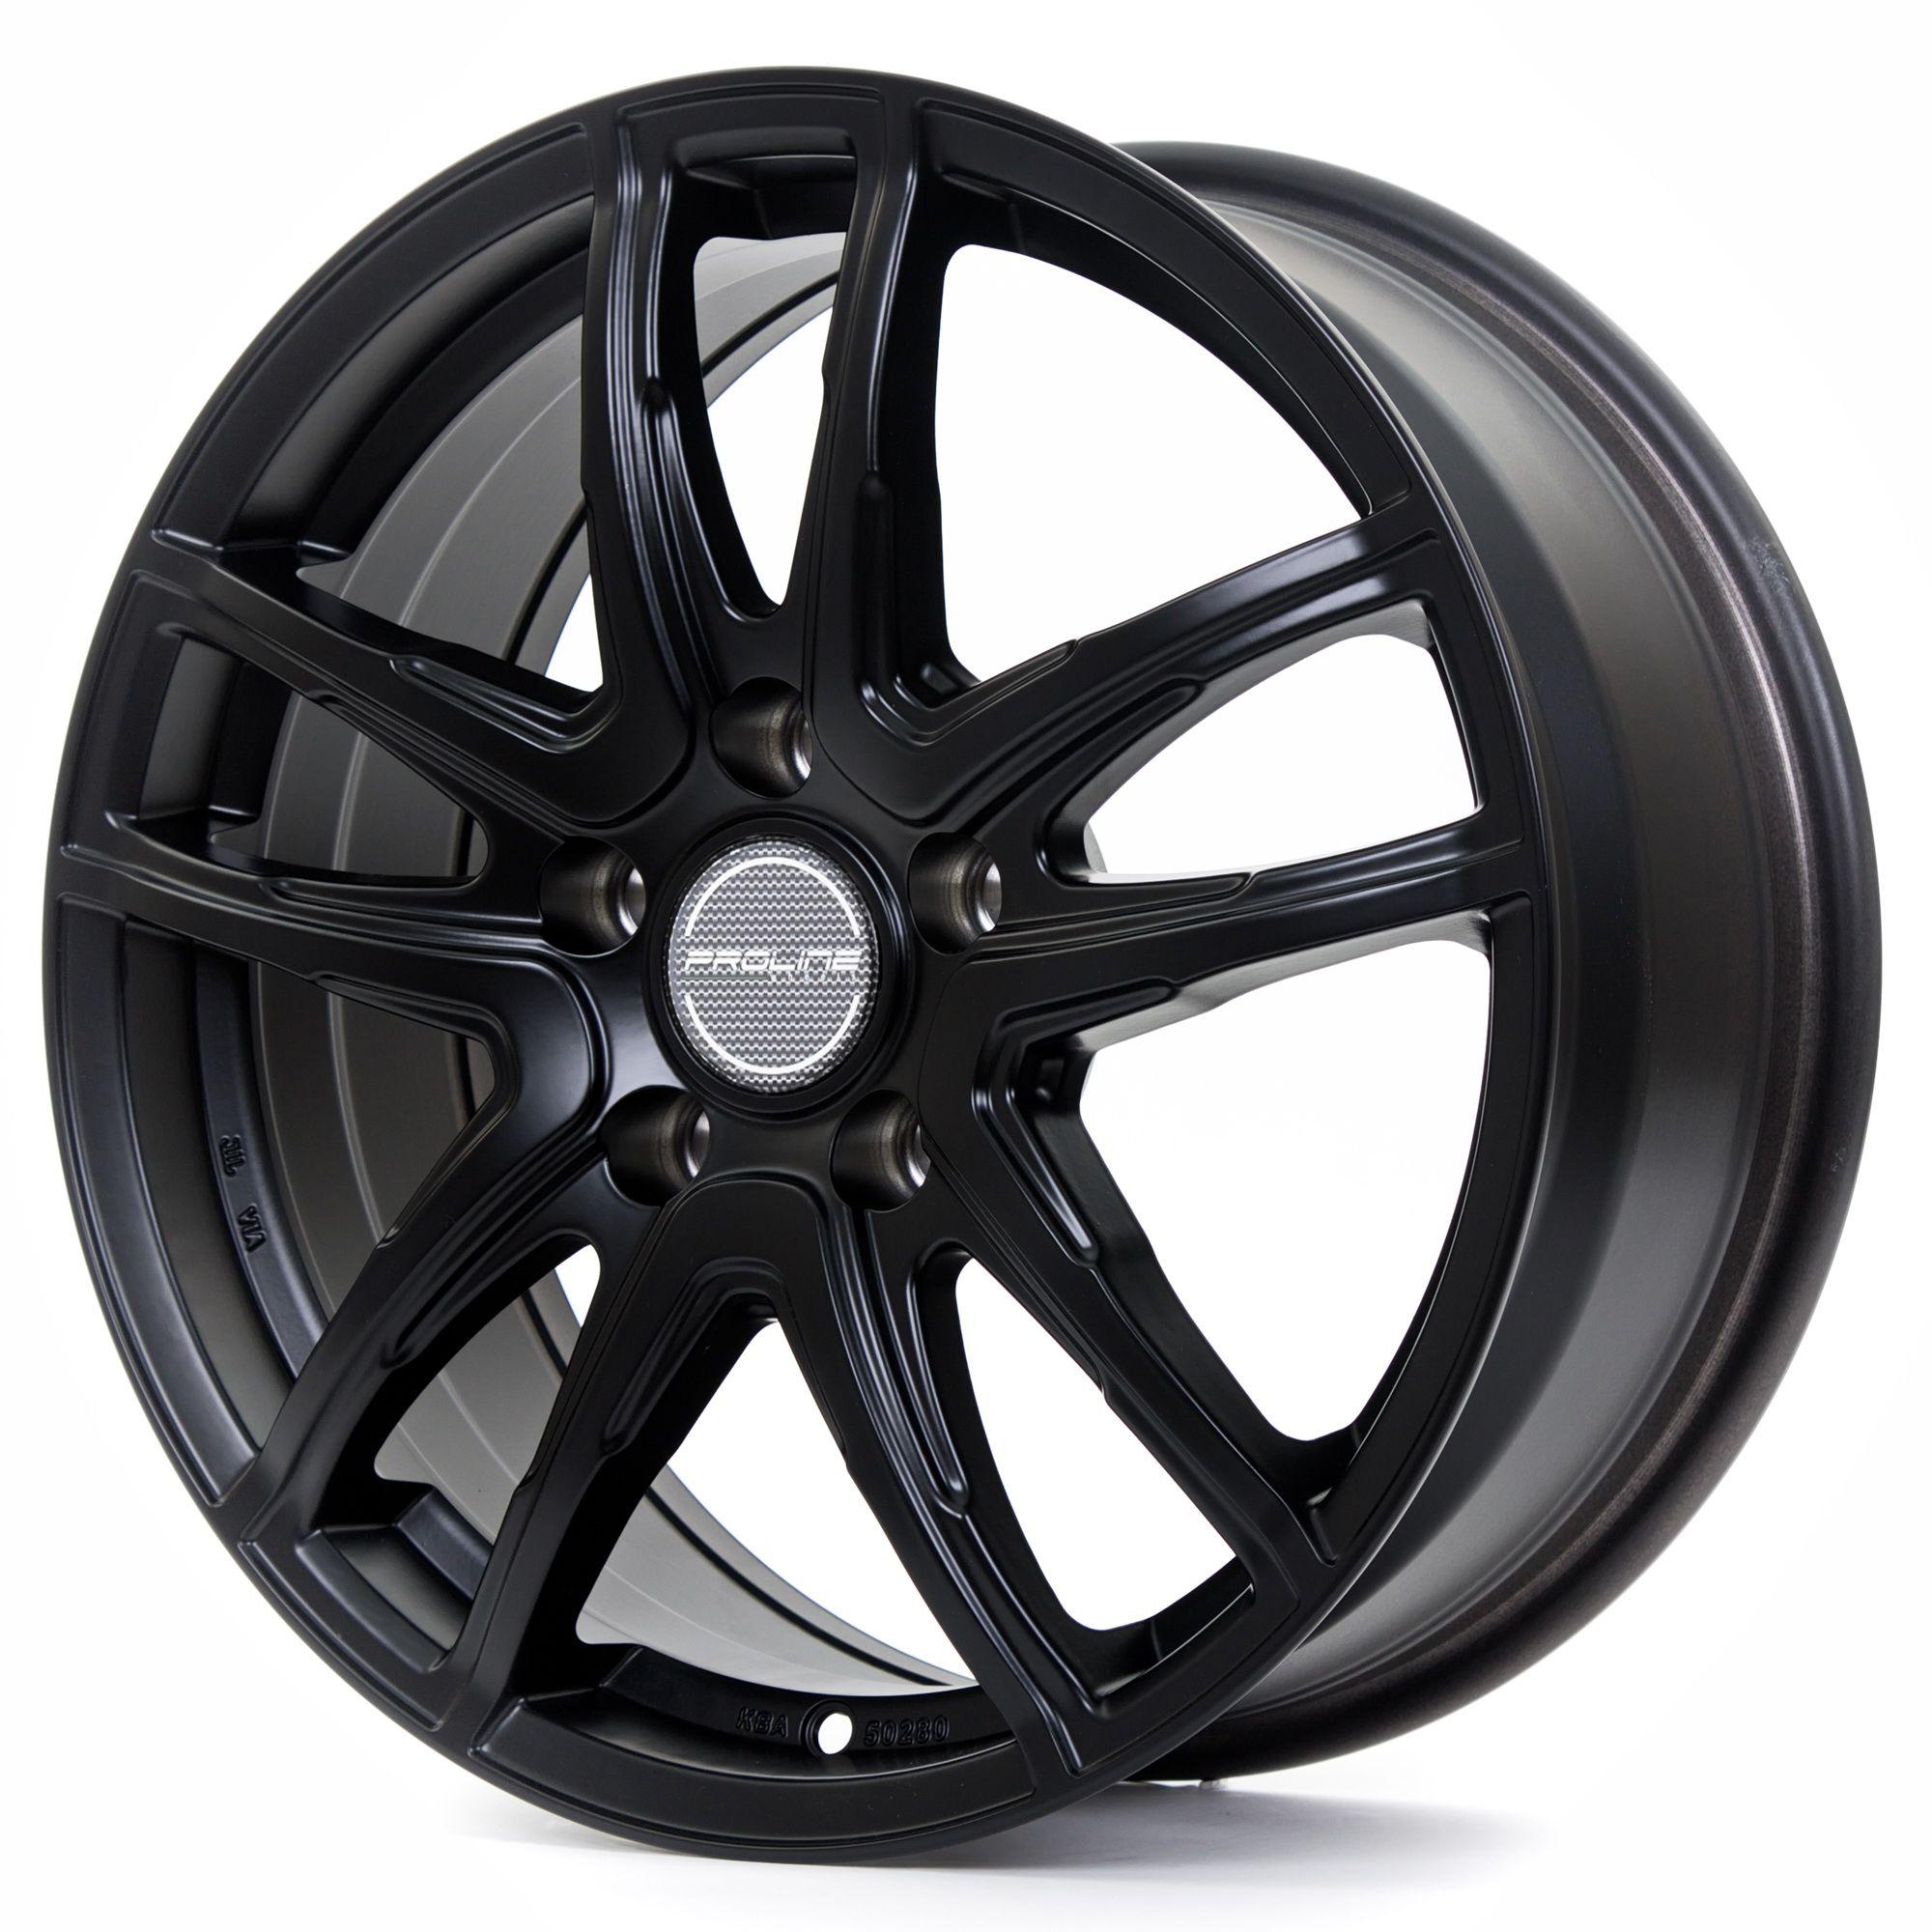 Proline Wheels Vx100 Felgen Black Matt Schwarz In 15